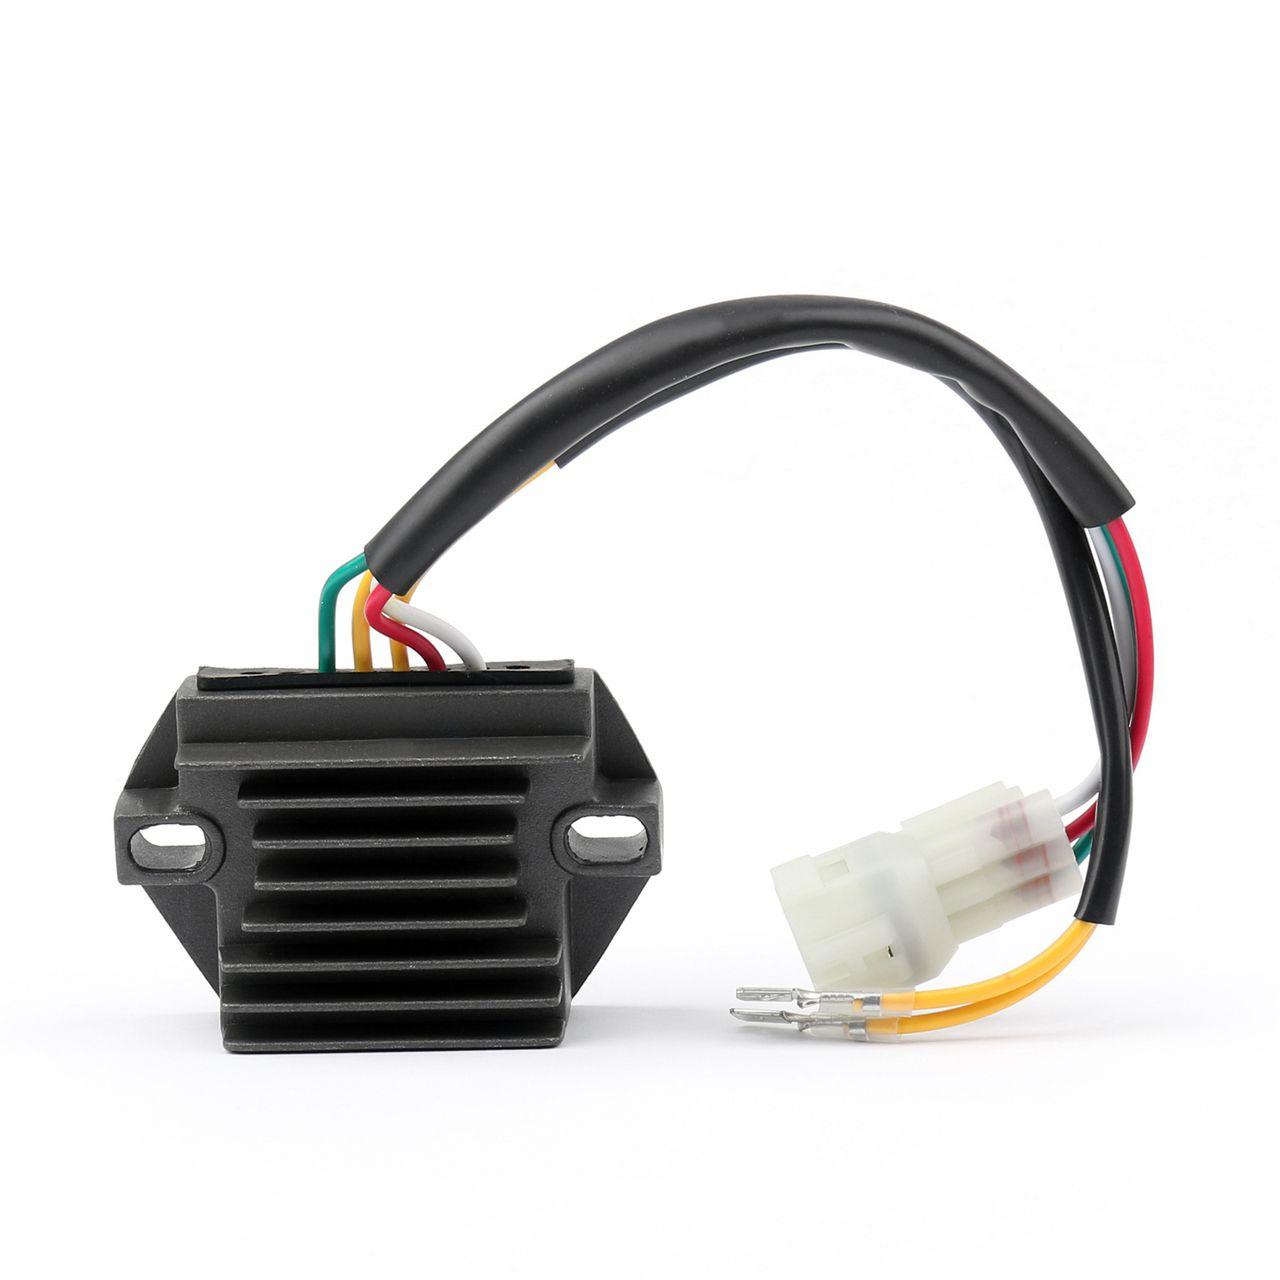 Voltage Regulator Rectifier For 450sx F 250 Sx F 450 Sx F 350 Xc F Smr Musquin Replica Ktm 250 Voltage Regulator Ktm